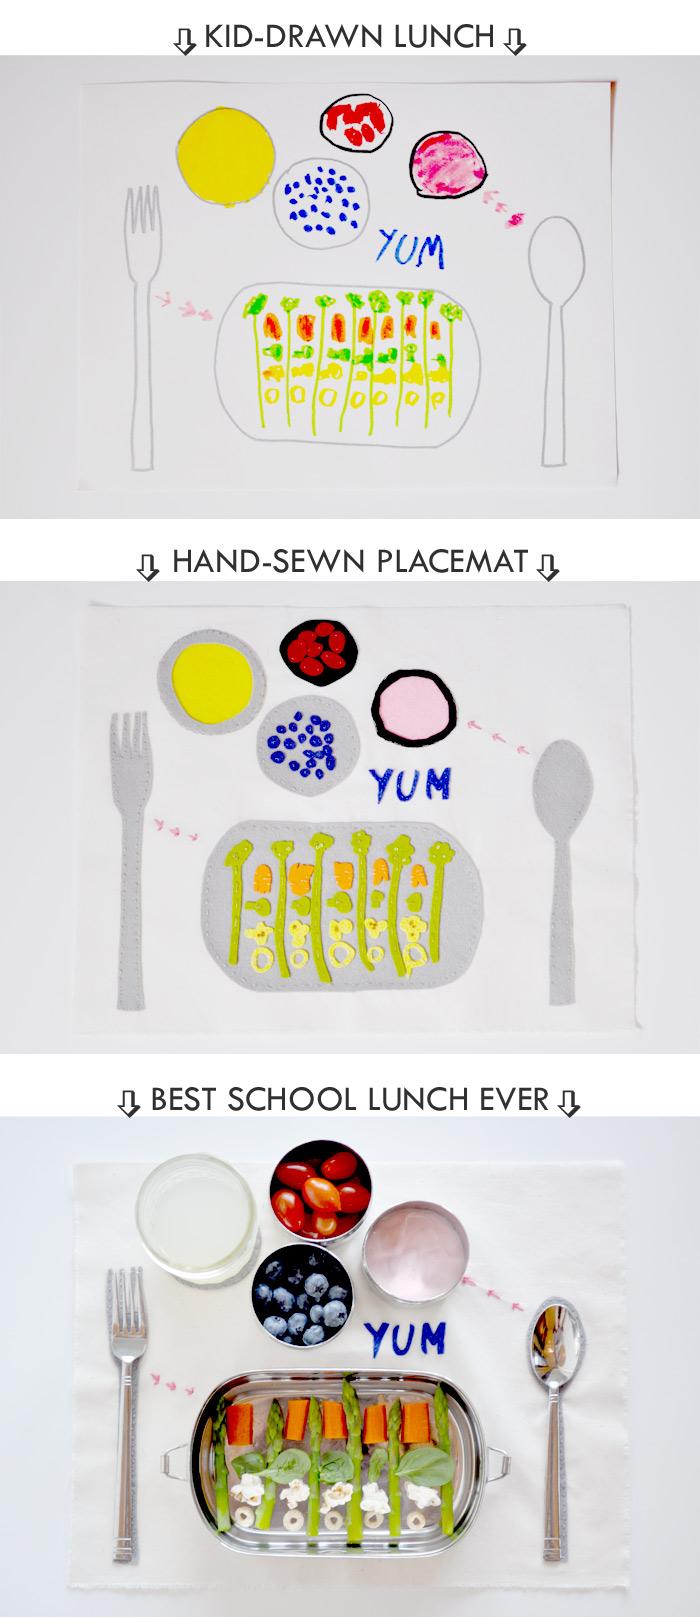 Lunch-Made-Fun---School-Pla